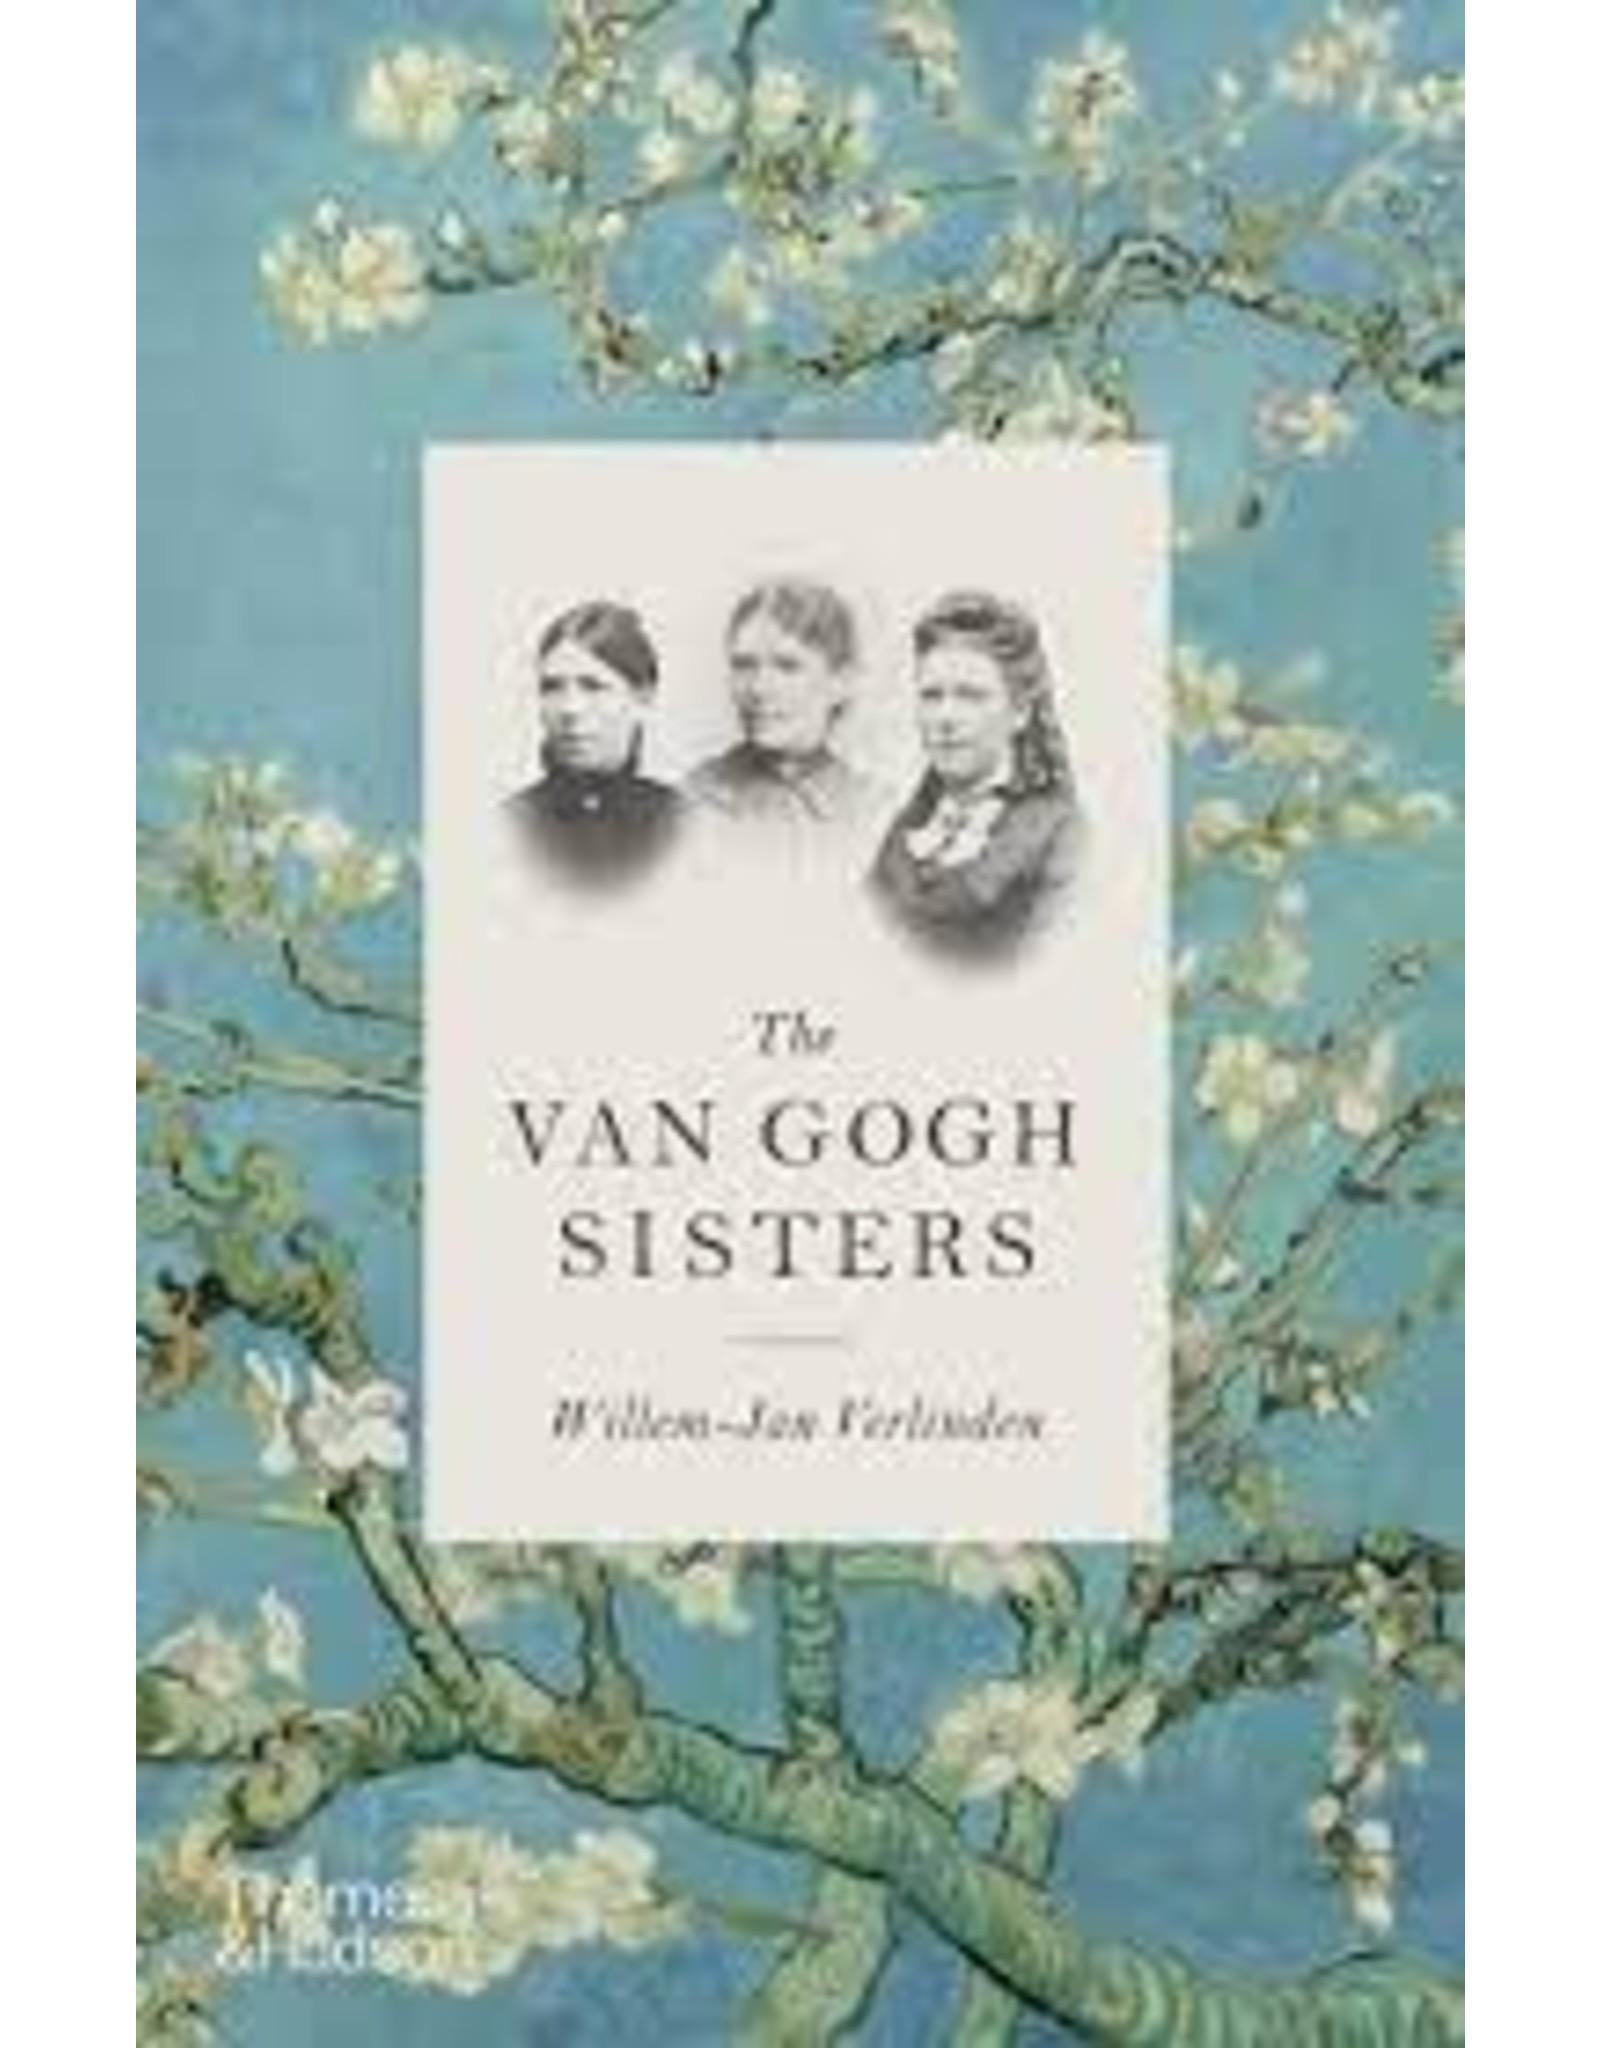 Books The Van Gogh Sisters by Willem-Jan Verlinden